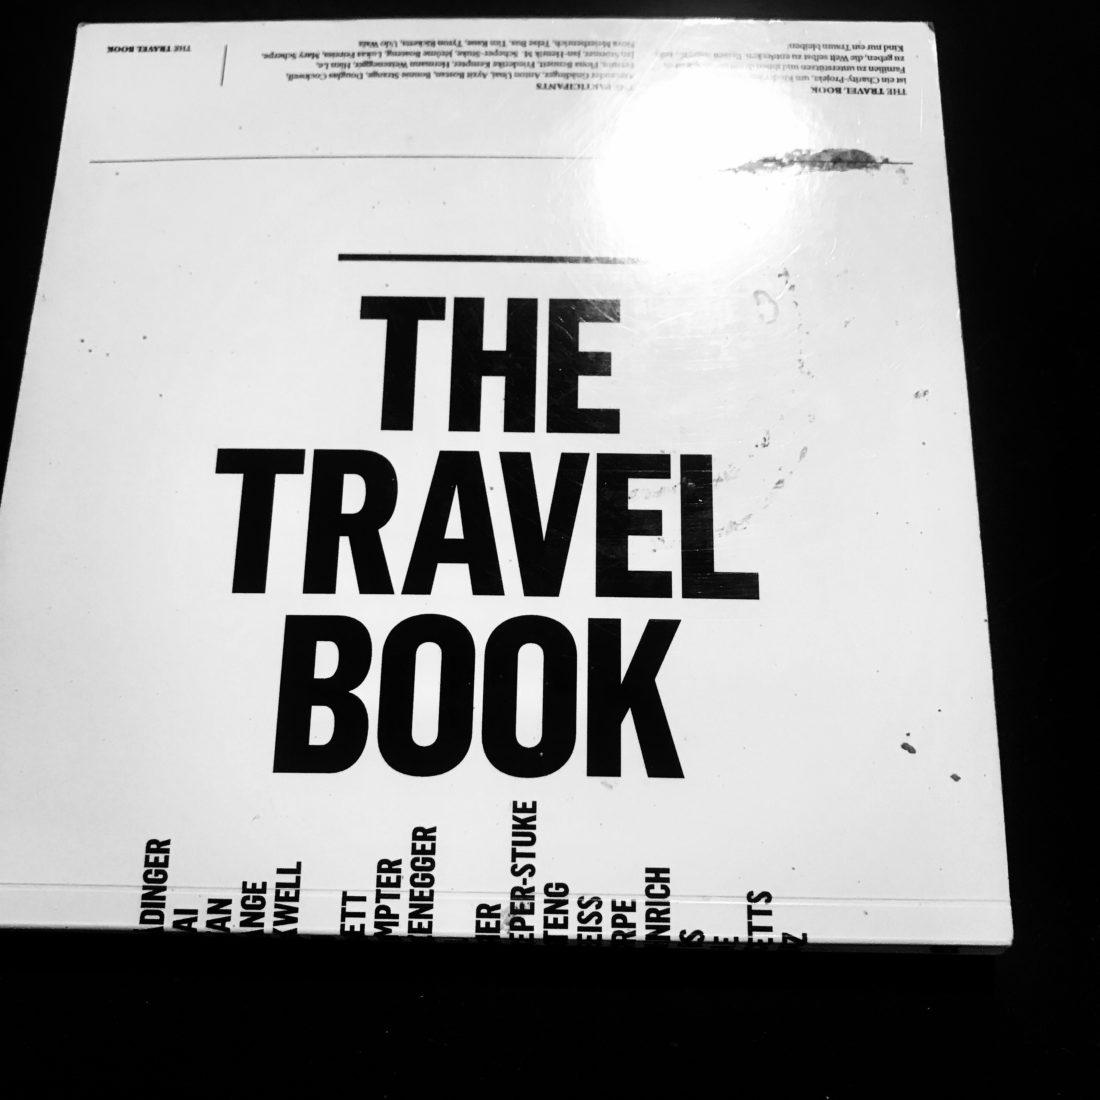 , BOLD TRAVEL BOOK, Telse Bus